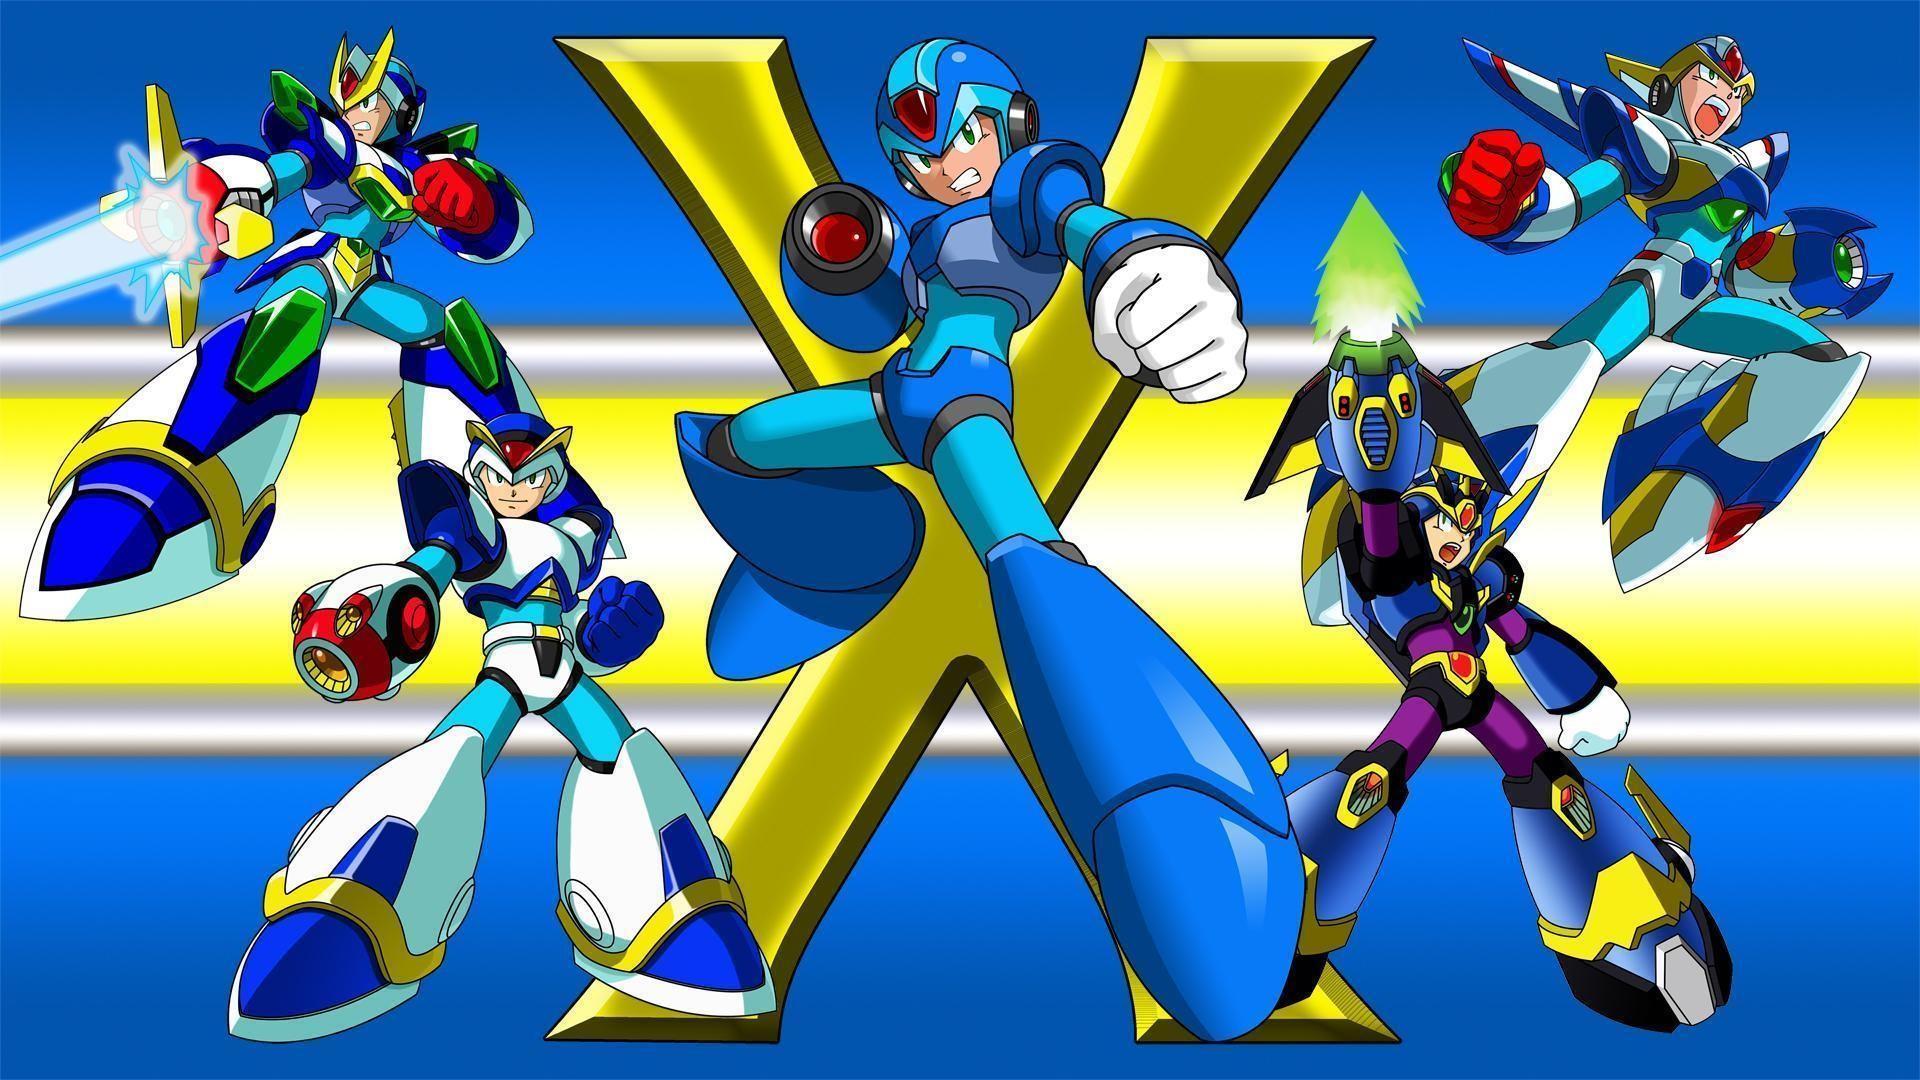 Megaman X Zero Wallpaper (69+ images)